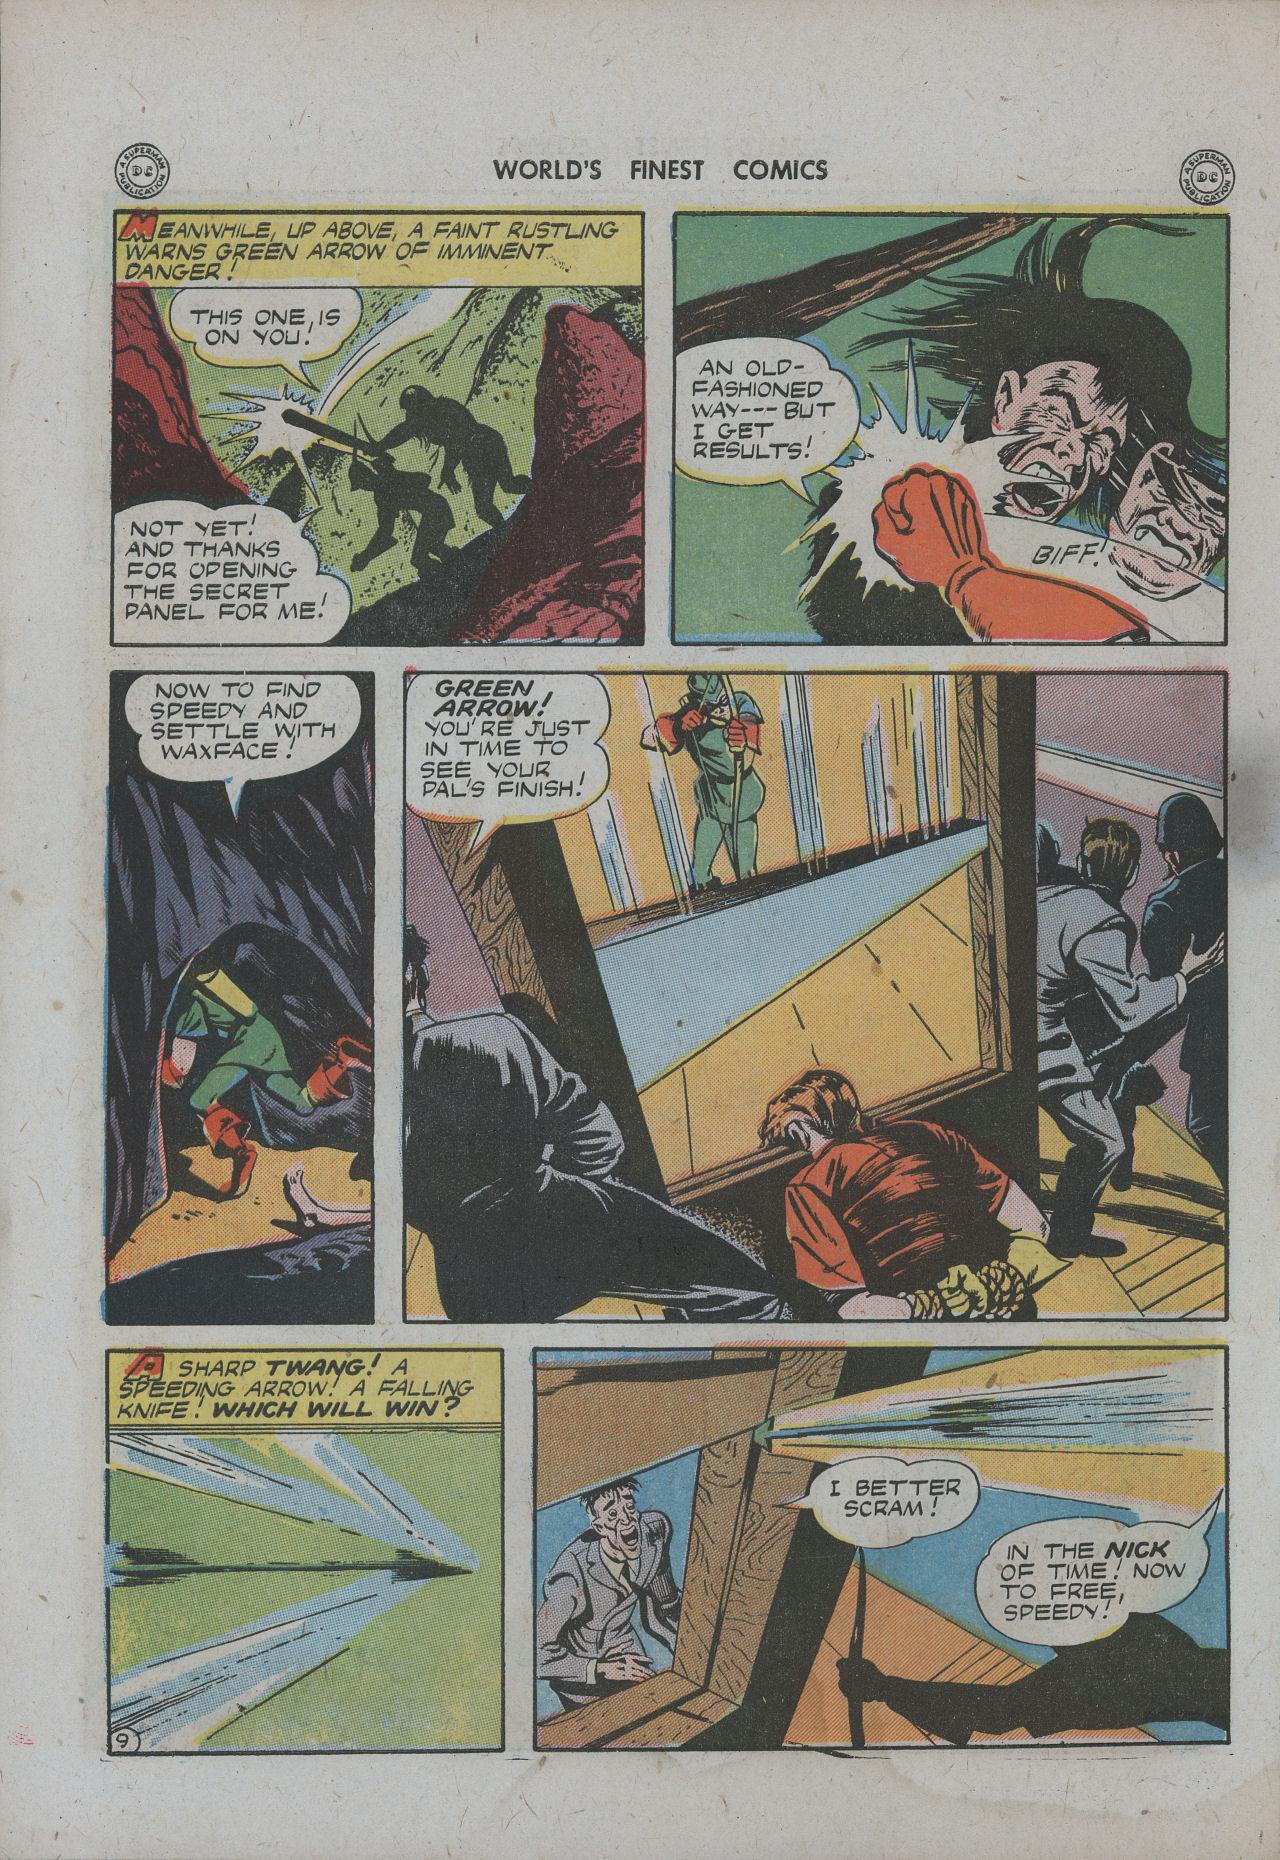 Read online World's Finest Comics comic -  Issue #15 - 45